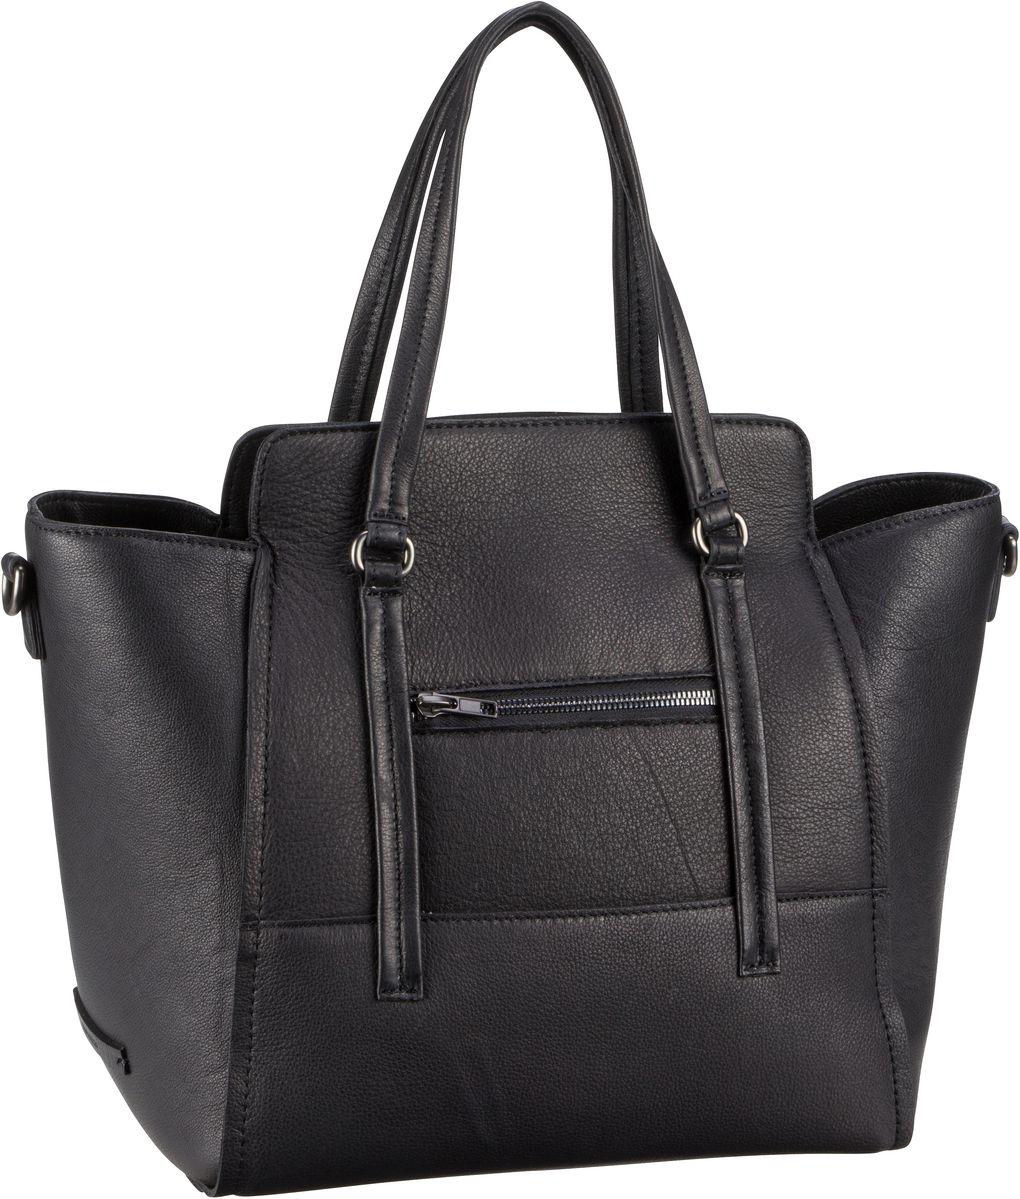 Fortyone Luxury Washed Black